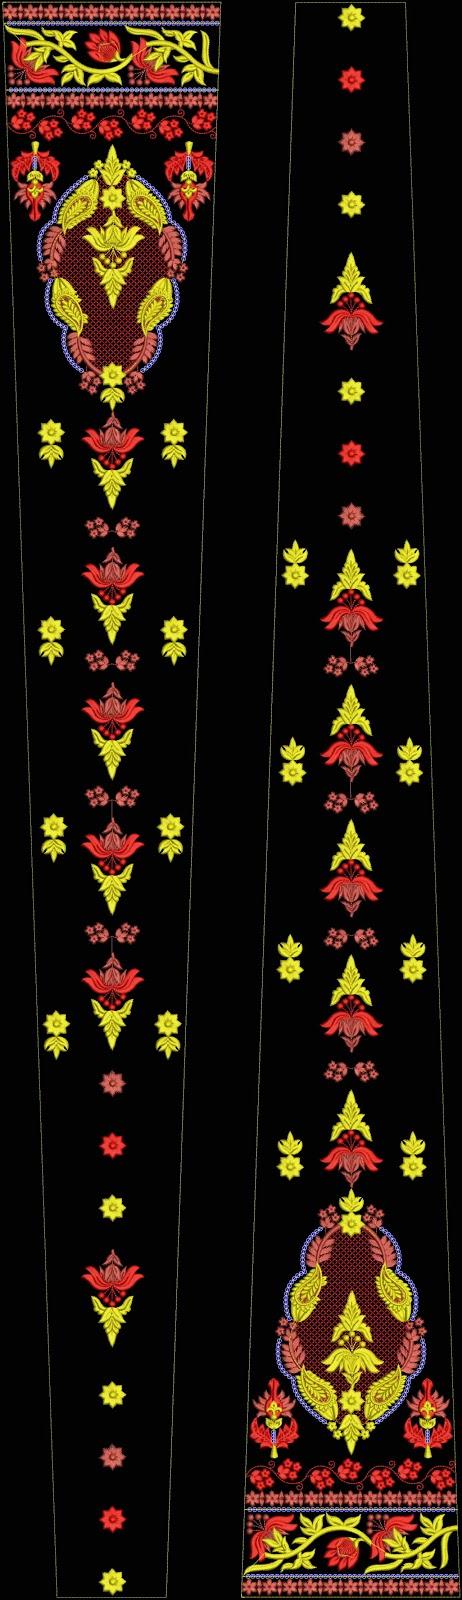 Embdesigntube Royal Neck Amp Ghagra Choli Embroidery Design